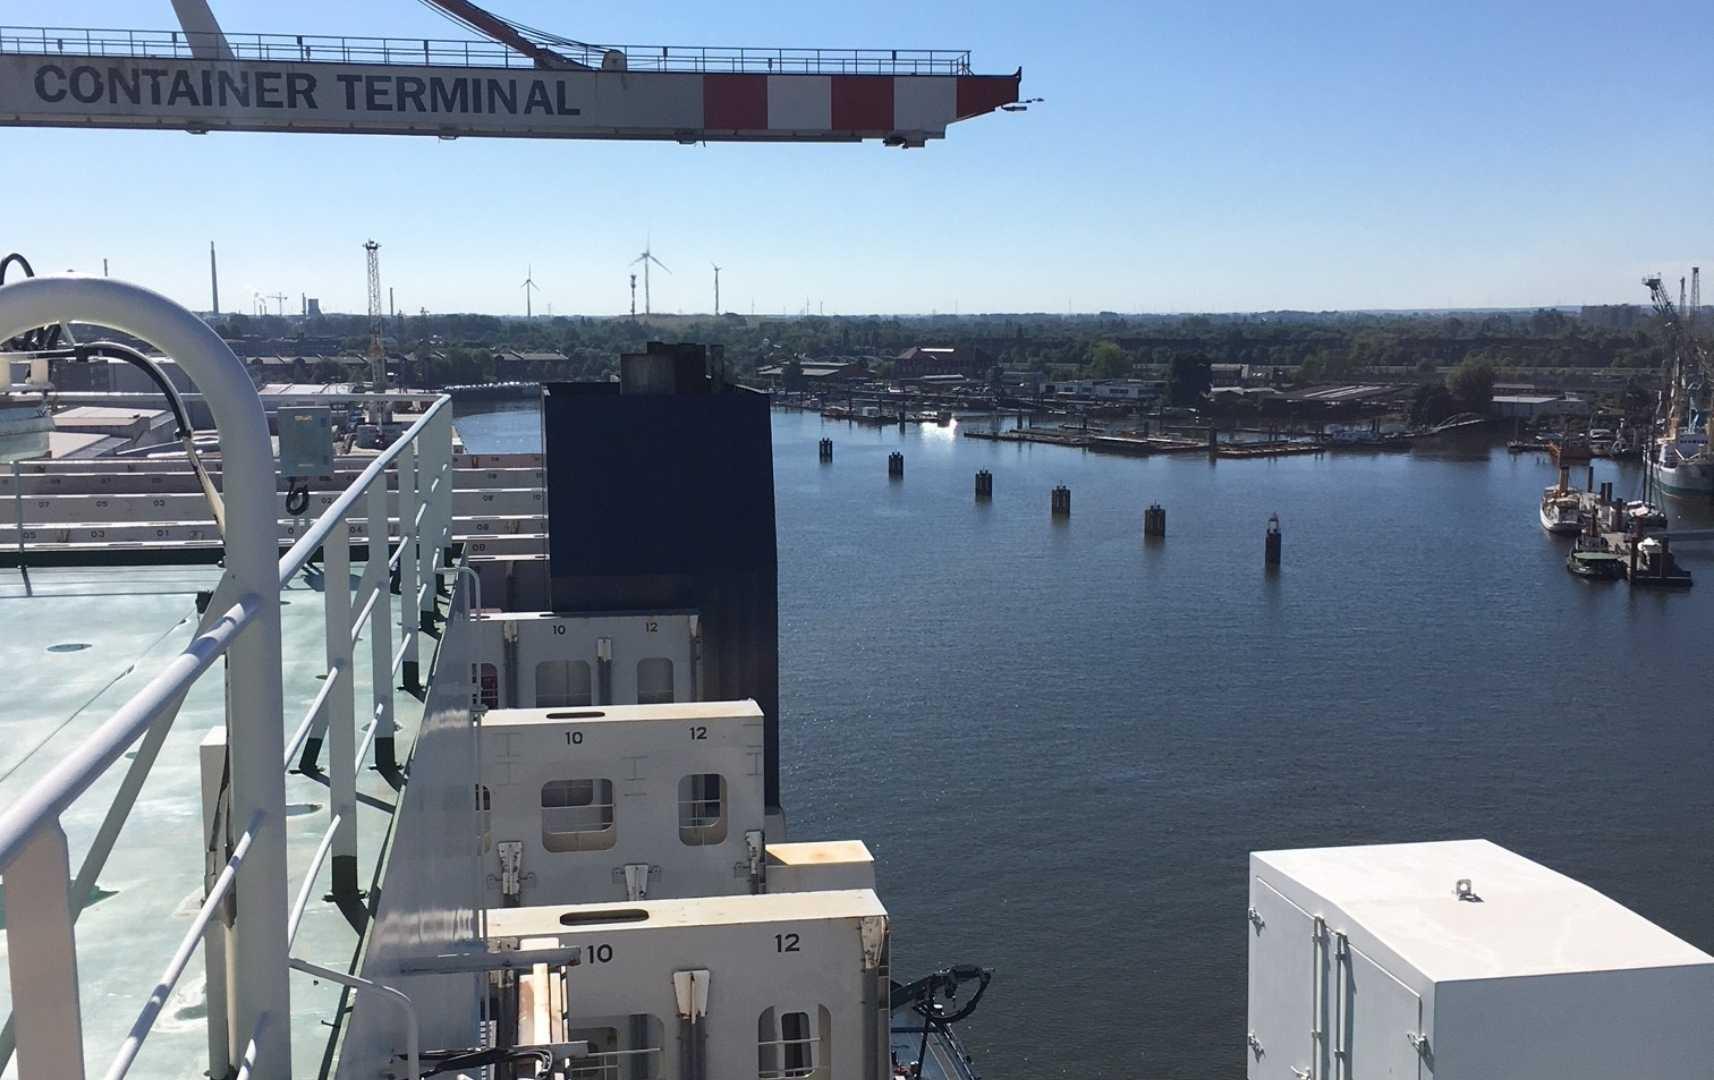 Container Terminal - Atlantic Sky